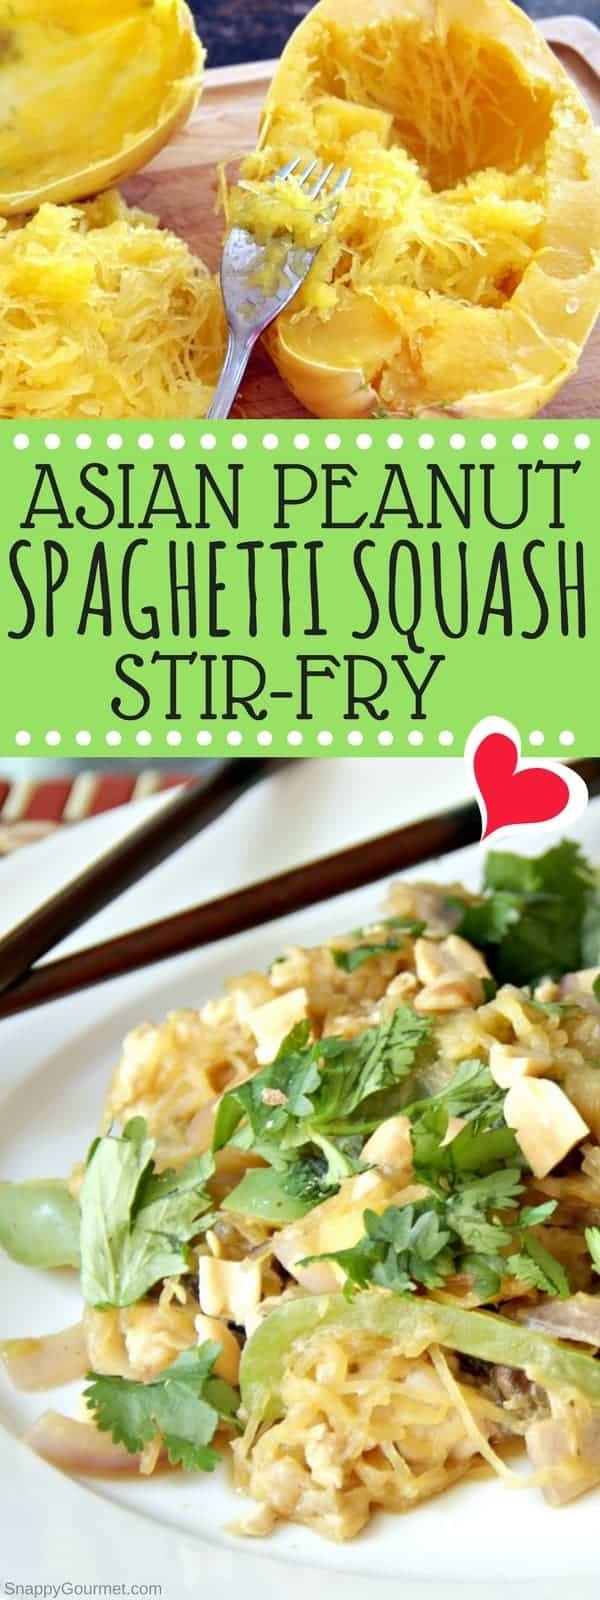 Asian Peanut Spaghetti Squash Stir-Fry Recipe - easy homemade chicken stir fry similar to pad thai